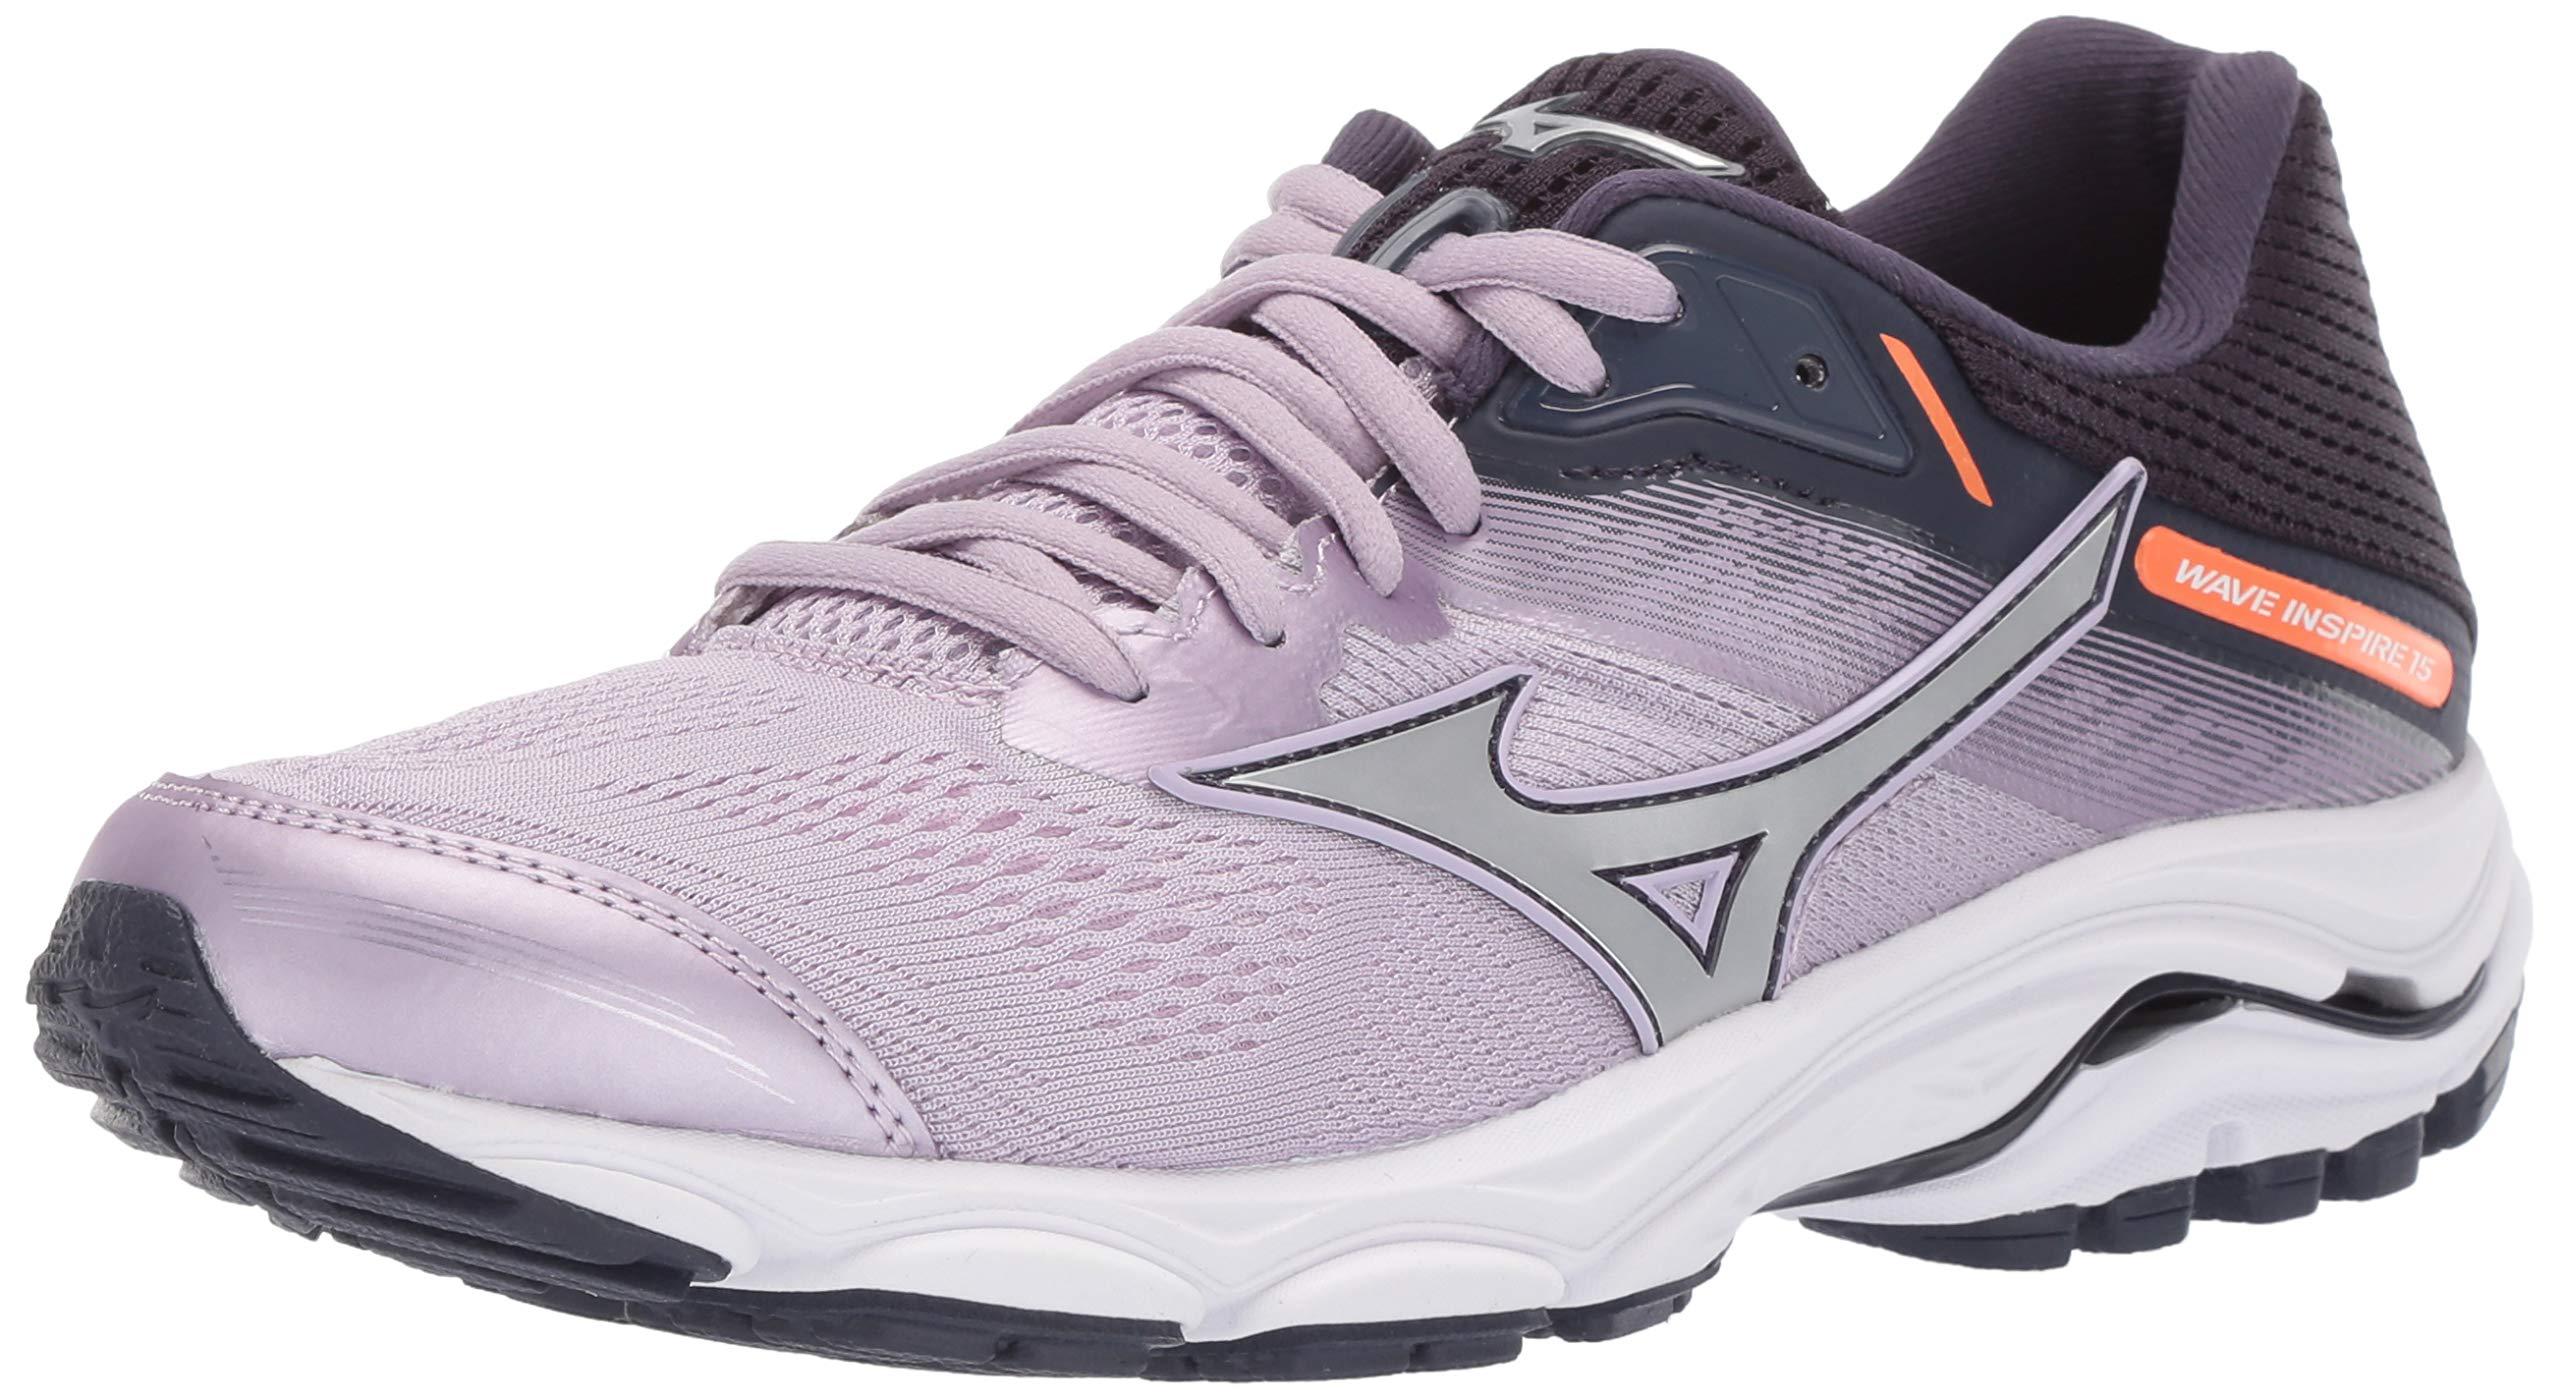 Mizuno Women's Wave Inspire 15 Running Shoe, Lavender Frost-Silver, 6 B US